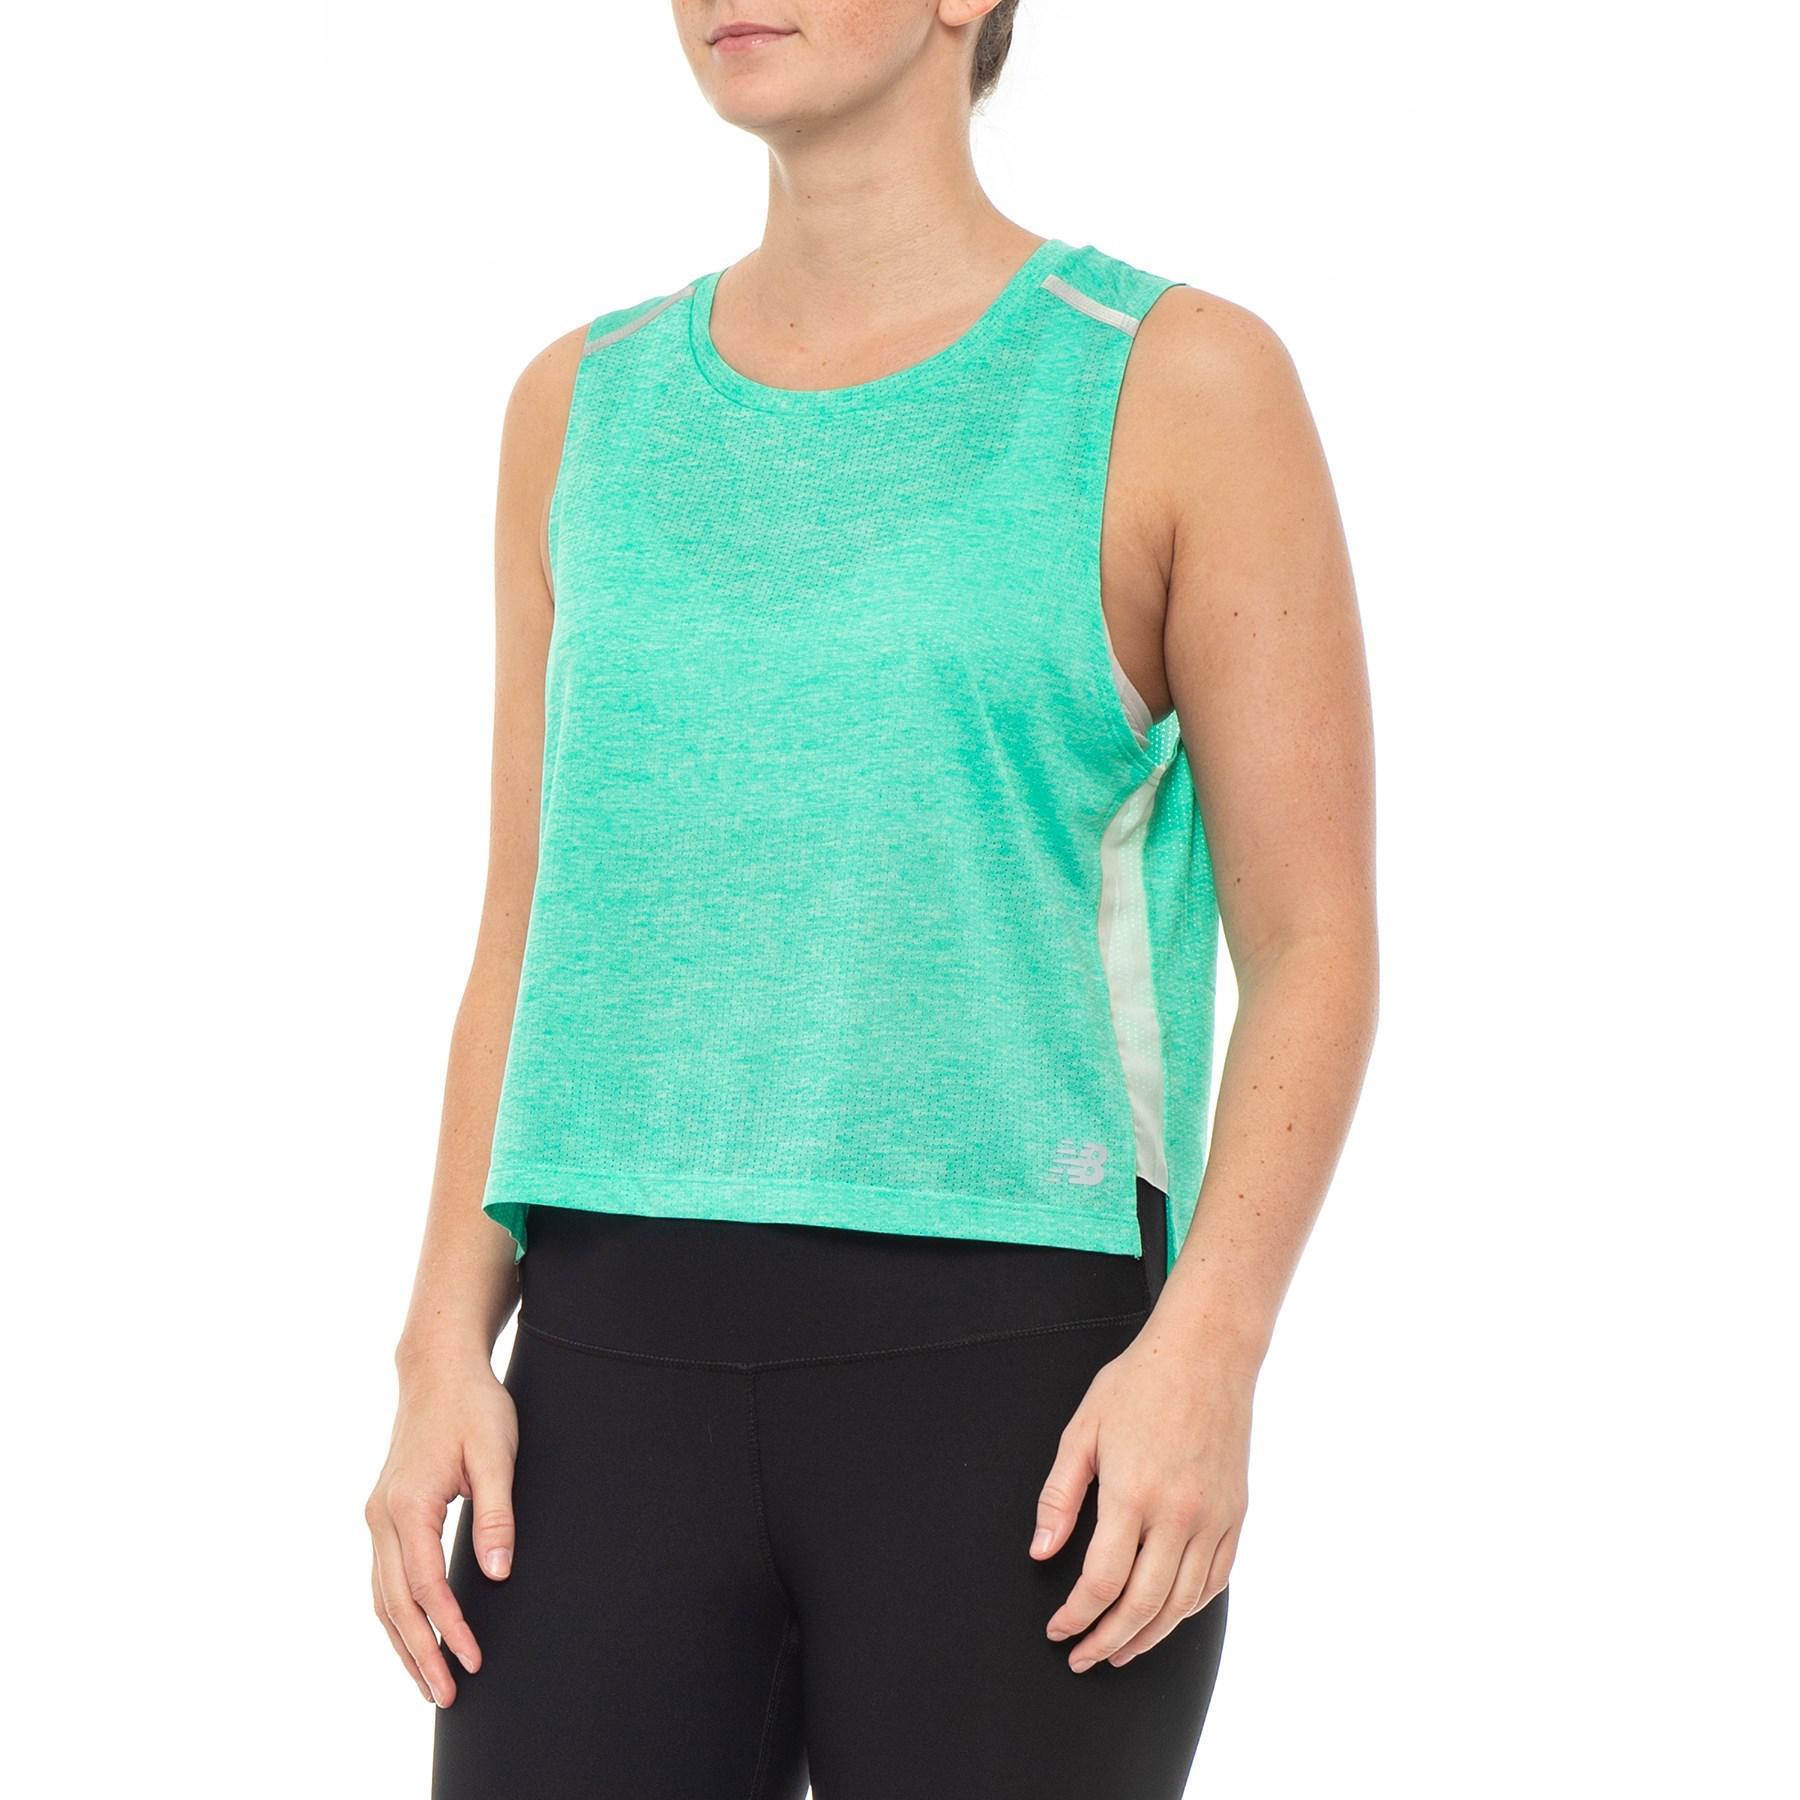 efdee18a841e4 Lyst - New Balance Nb Ice Crop Tank Top (for Women) in Green